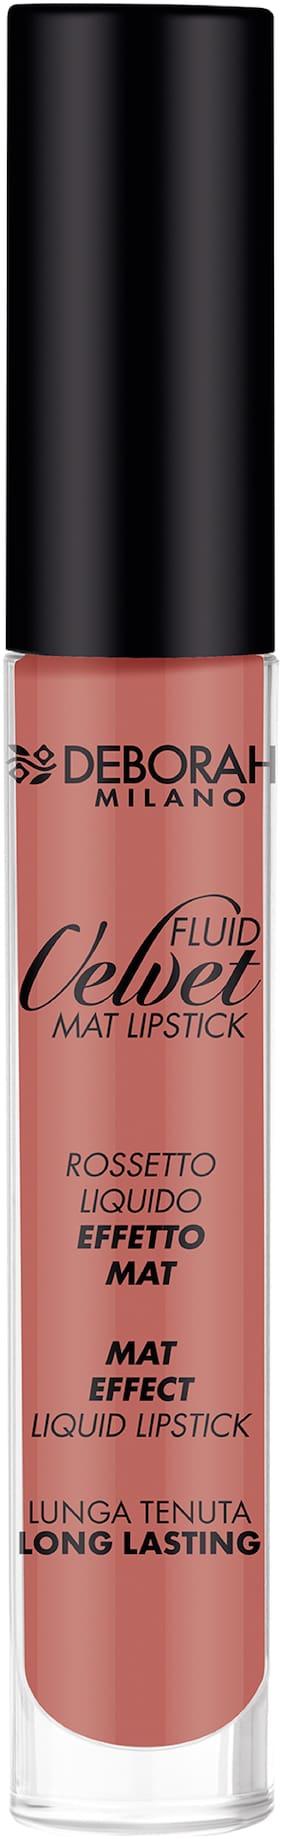 Deborah Milano FLUID VELVET MAT Lipstick - 1 ANTIQUE ROSE